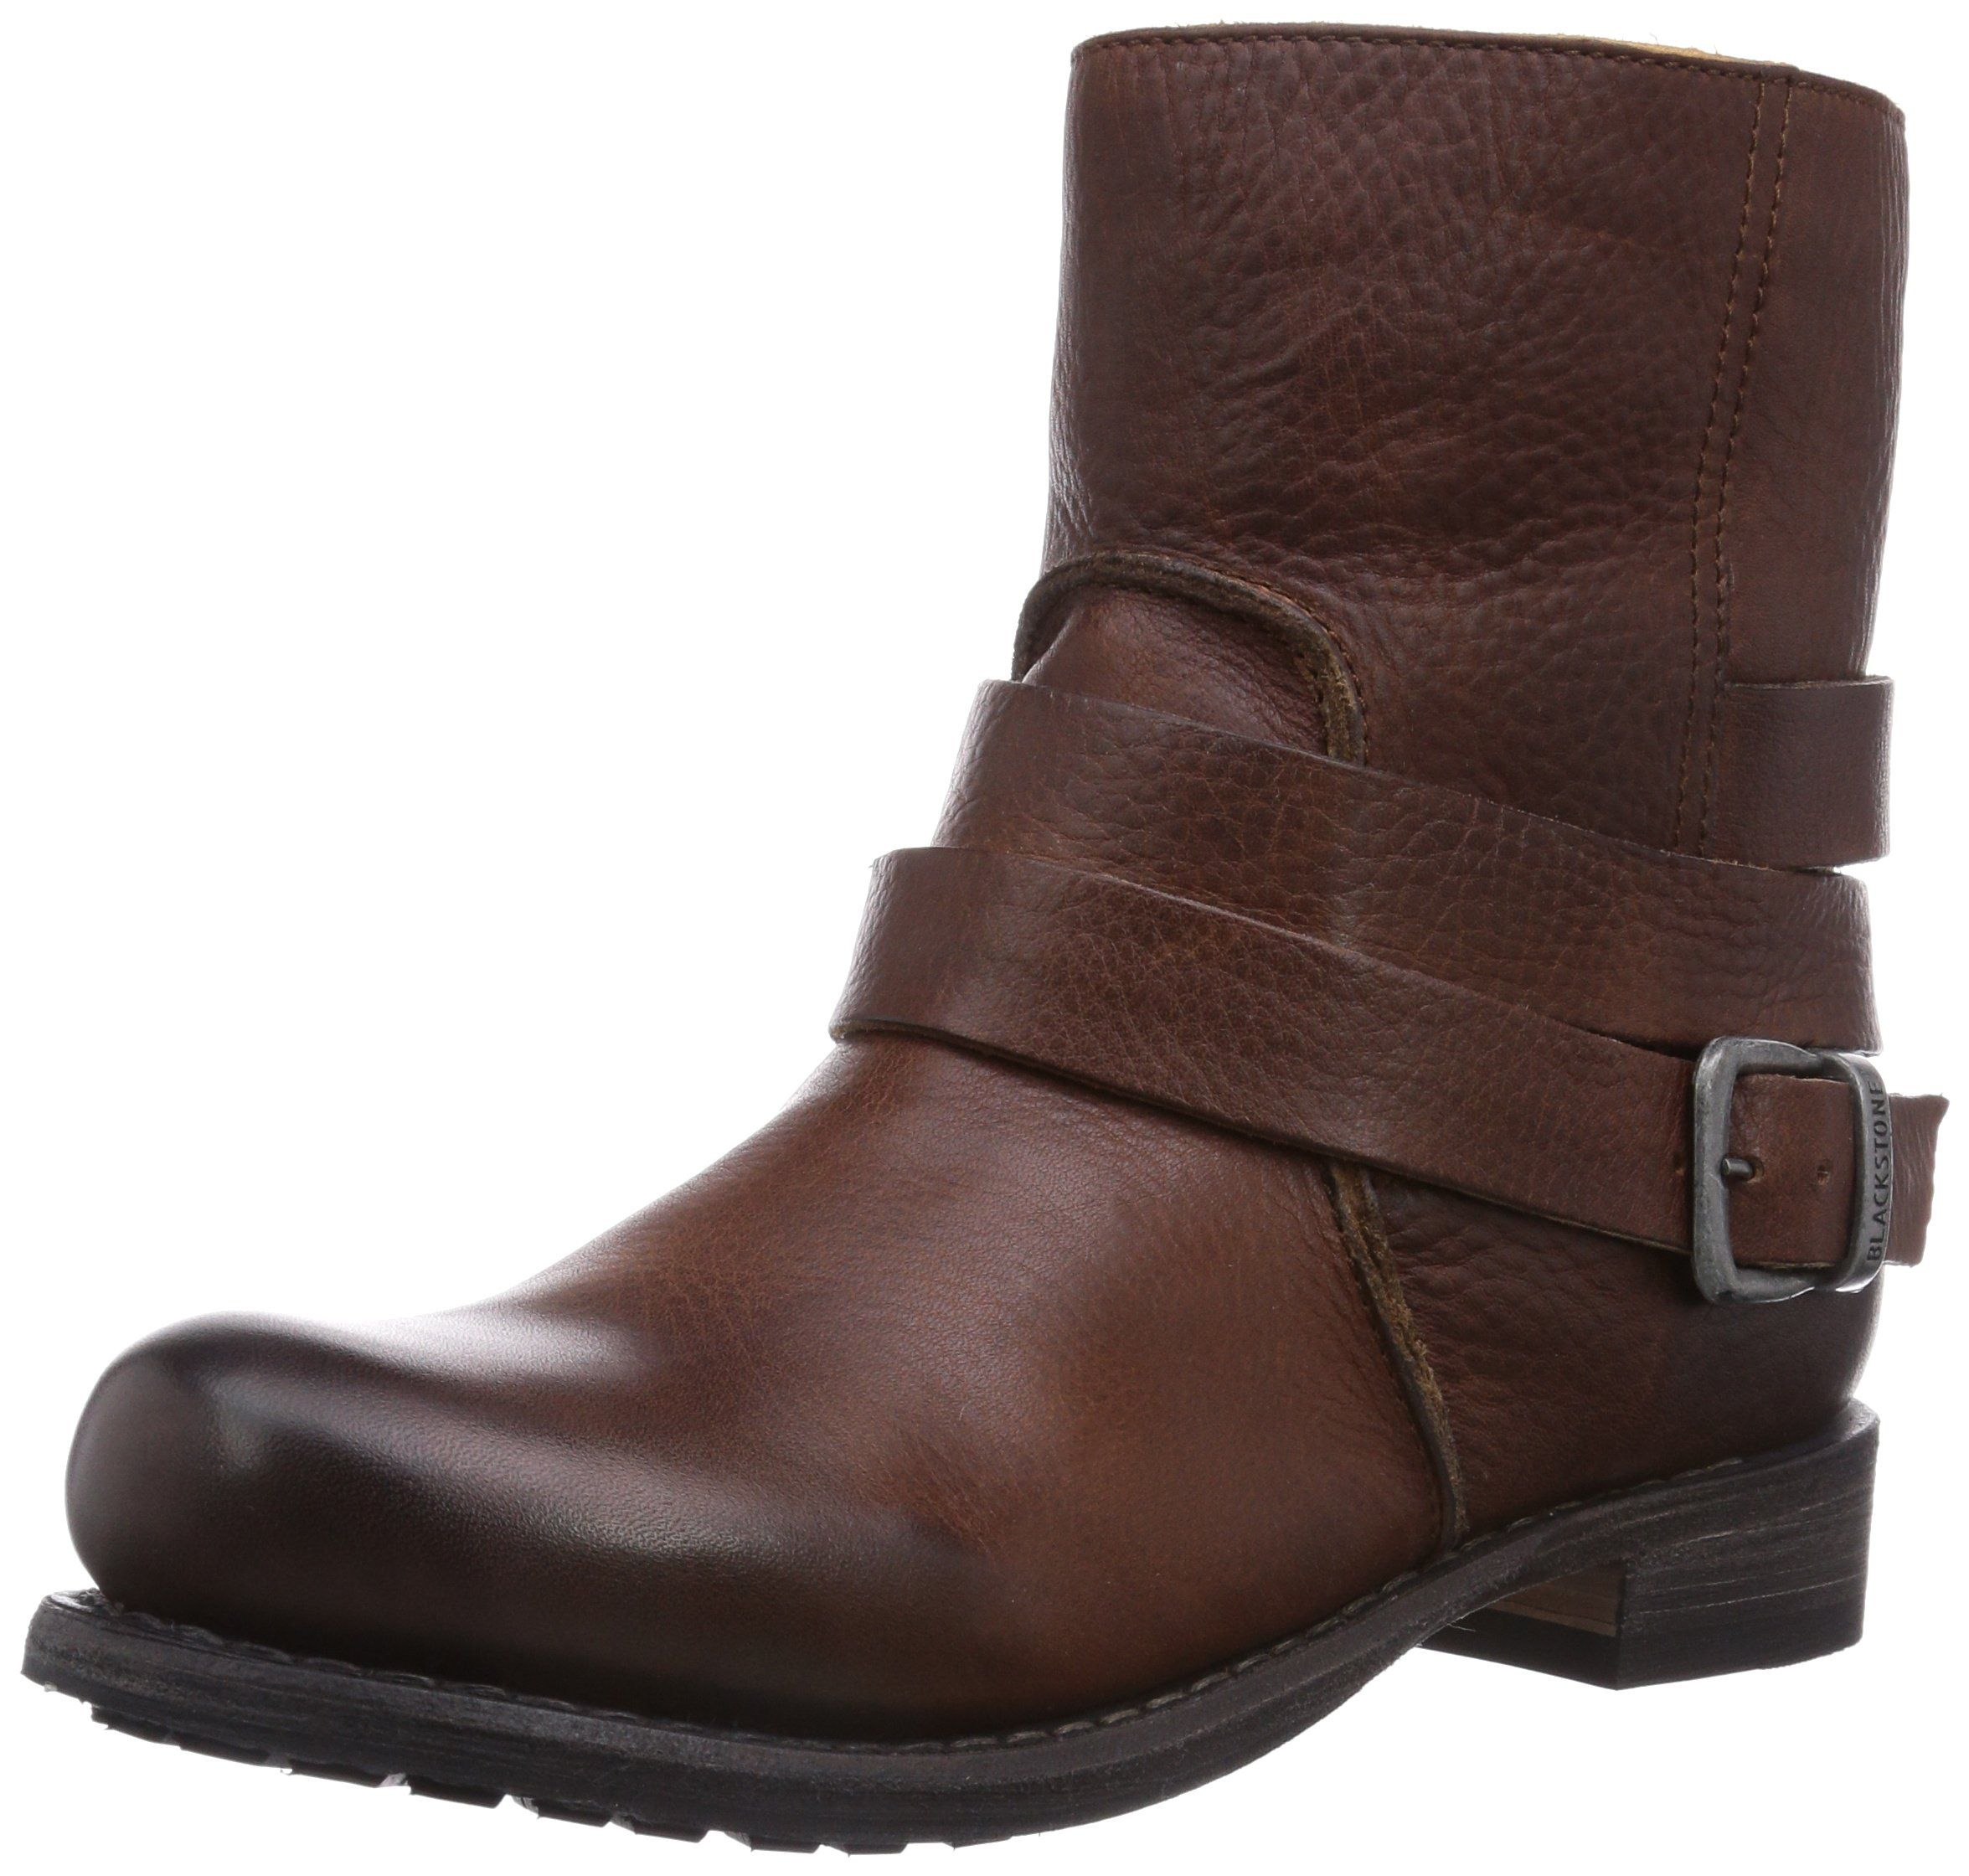 Blackstone IL95 OLD YELLOW SHEEPSKIN, Damen Biker Boots, Braun (old yellow),